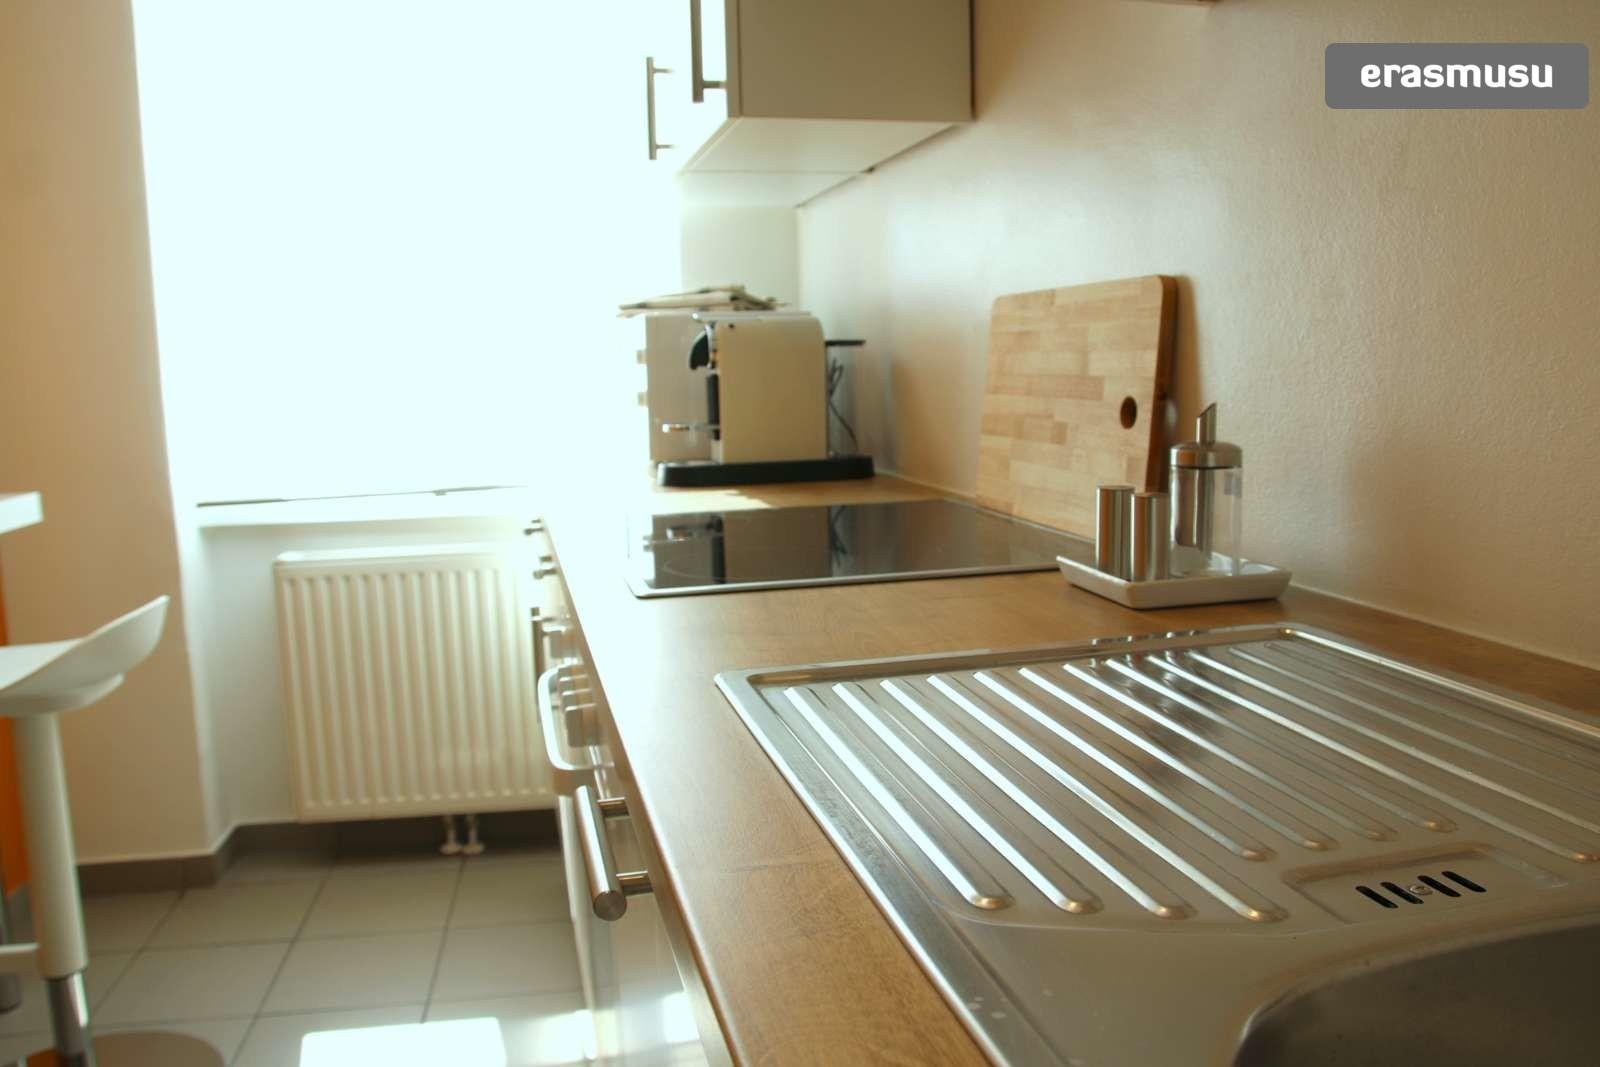 lovely-studio-apartment-rent-wahring-b79e3a2850d4e45be1f7e8873fb